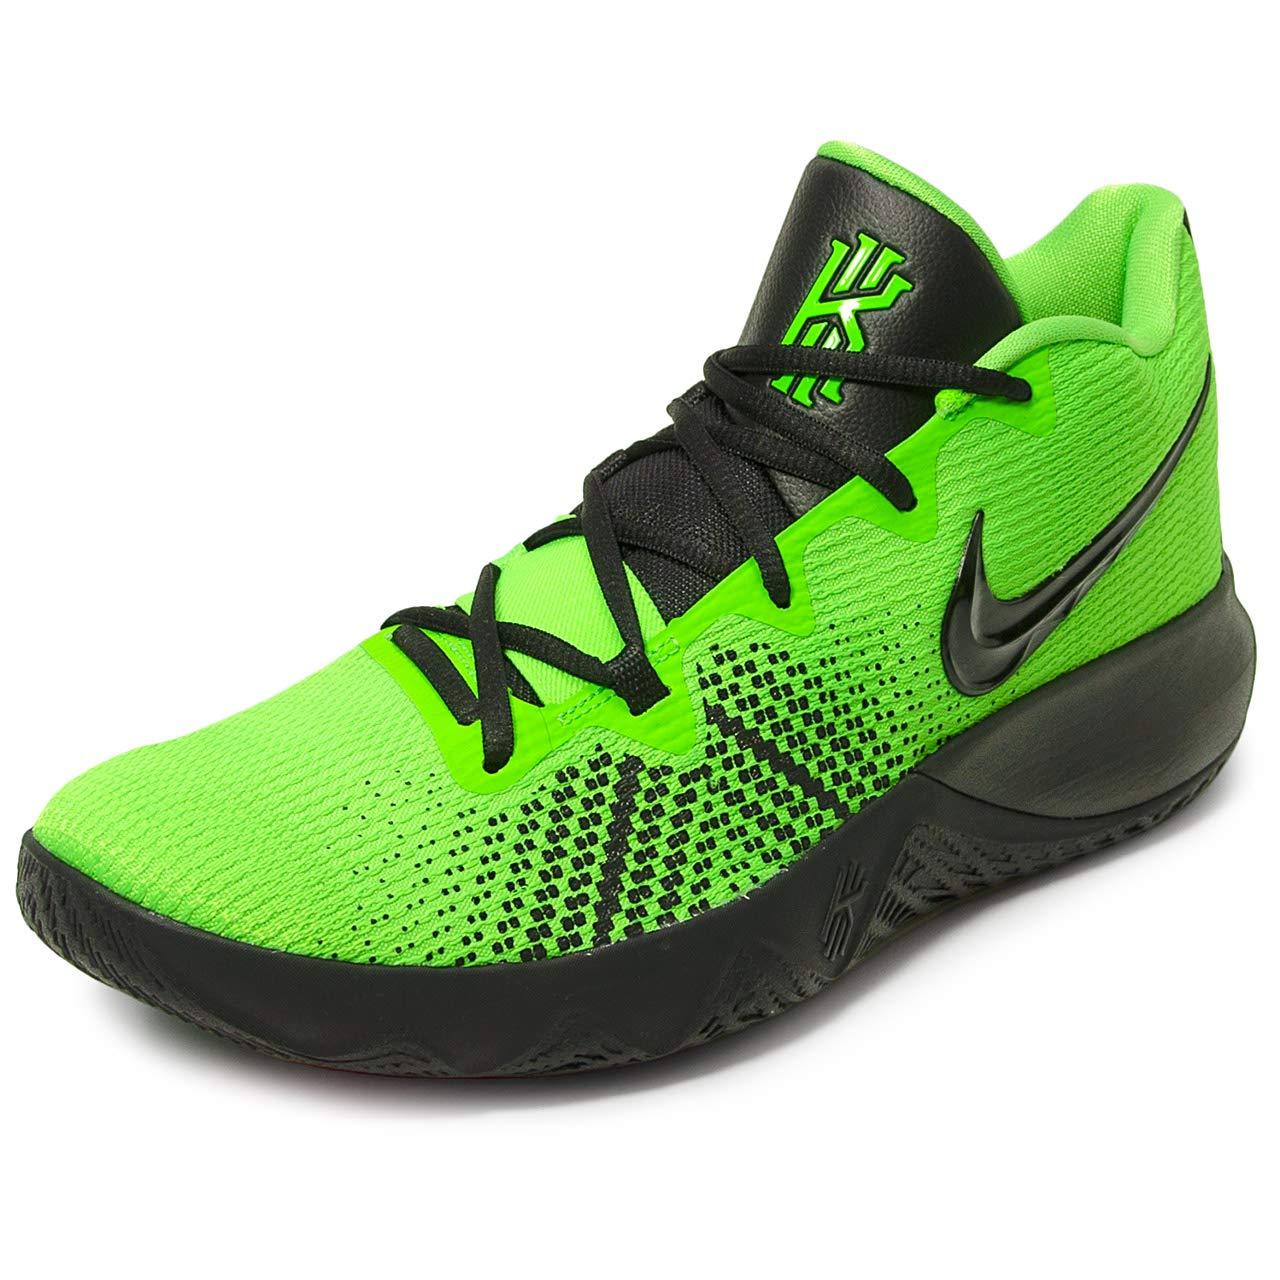 cb393ff33b8f9 Amazon.com | Nike Mens Kyrie Flytrap Basketball High Top Sneakers ...